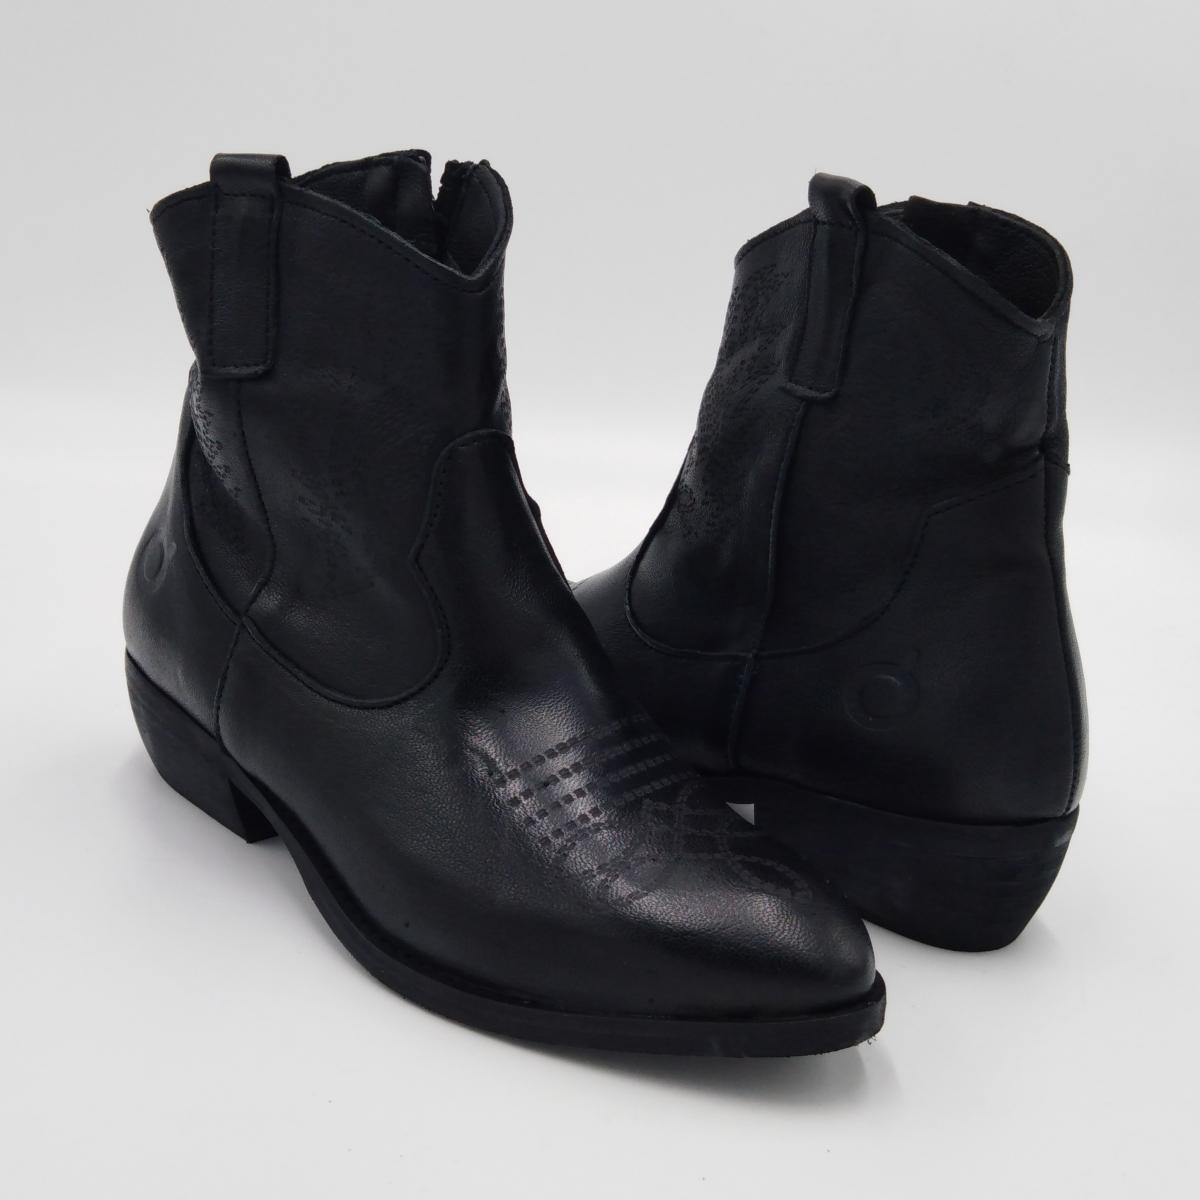 Onakò -Tronchetto texano nero